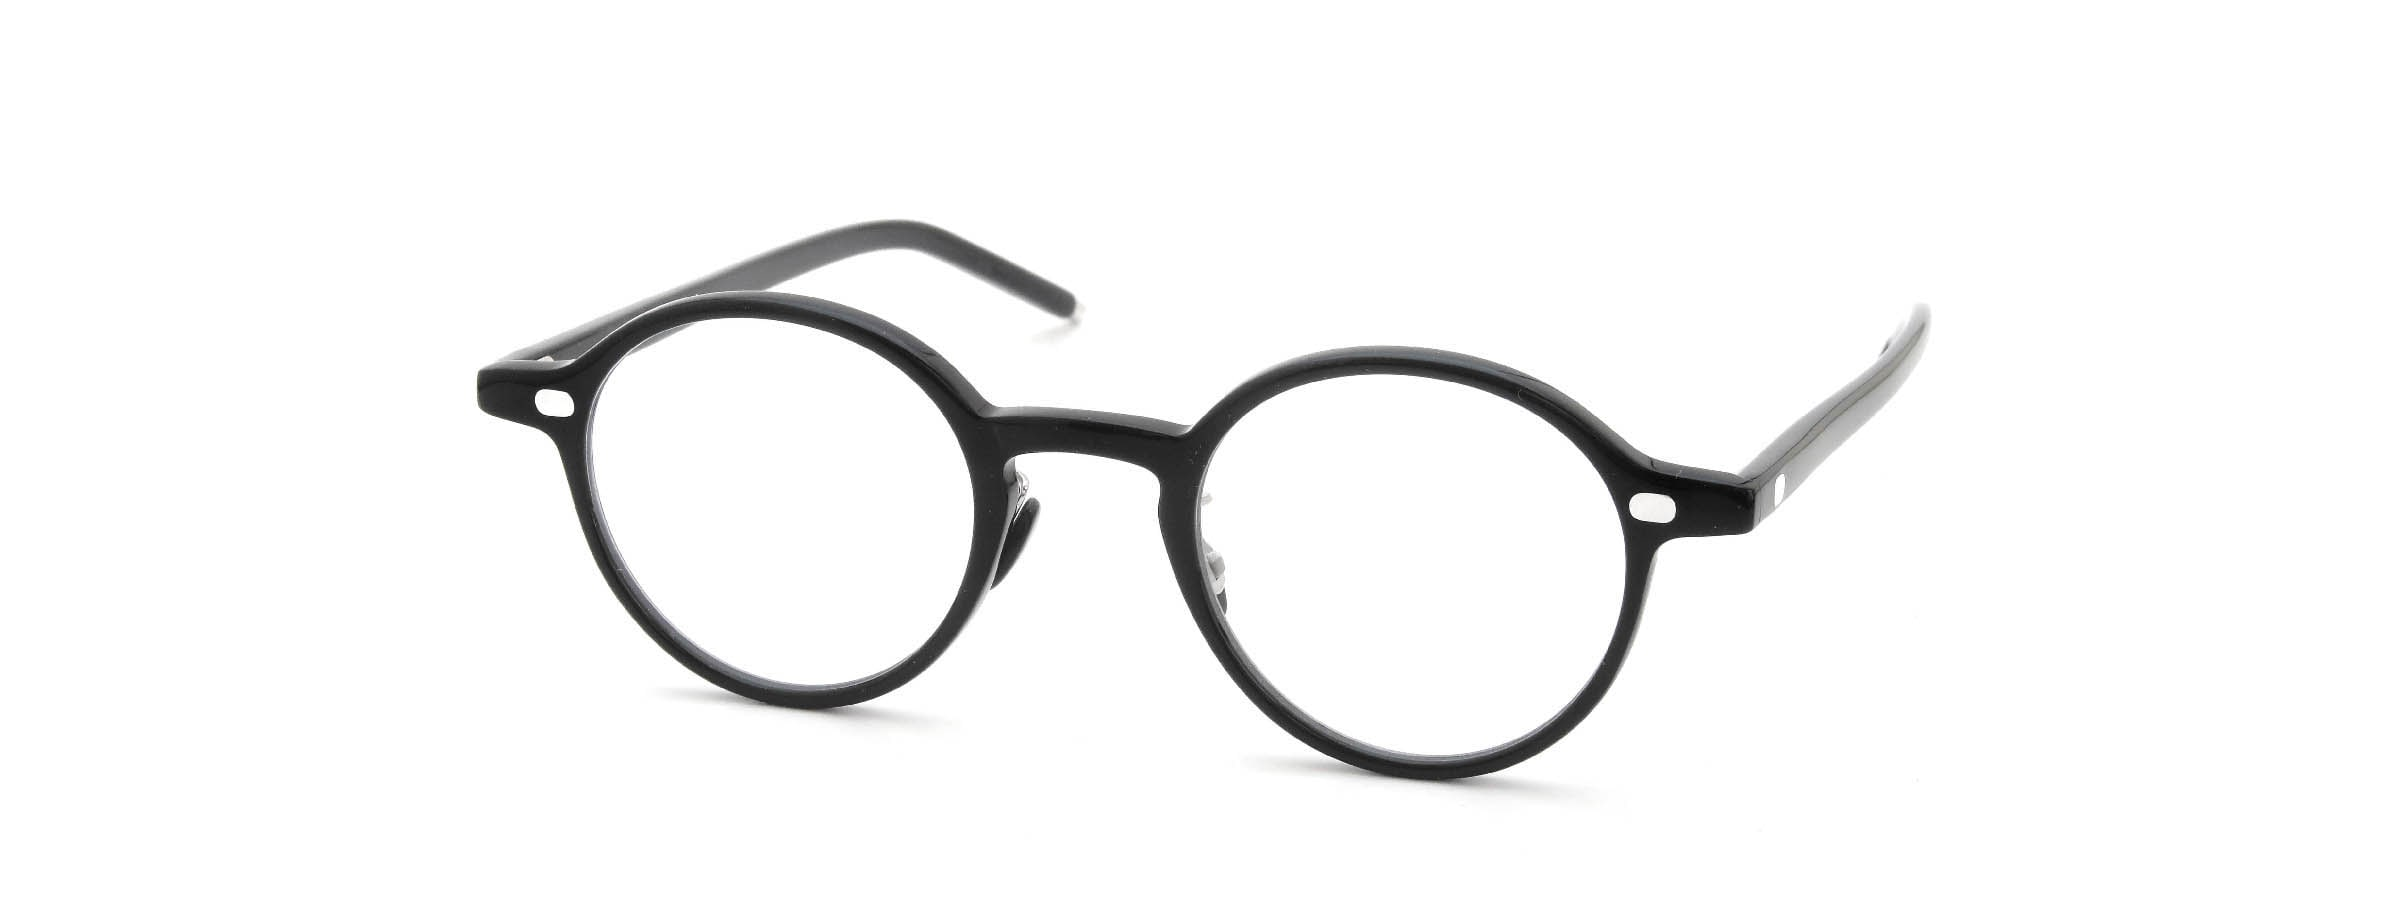 10 eyevan NO.5 Ⅲ 43size  c.1002S Black全体像